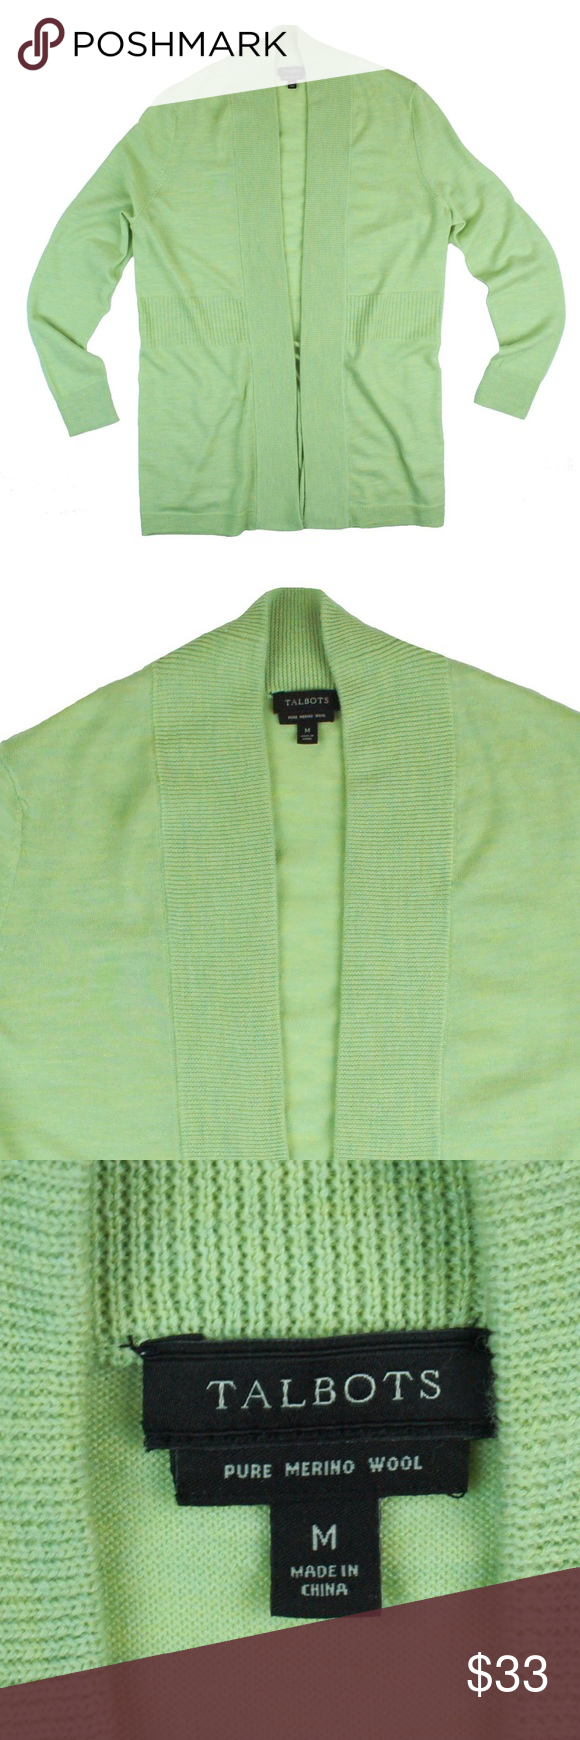 New TALBOTS Lime Melange Merino Cardigan Sweater NWOT. This new ...